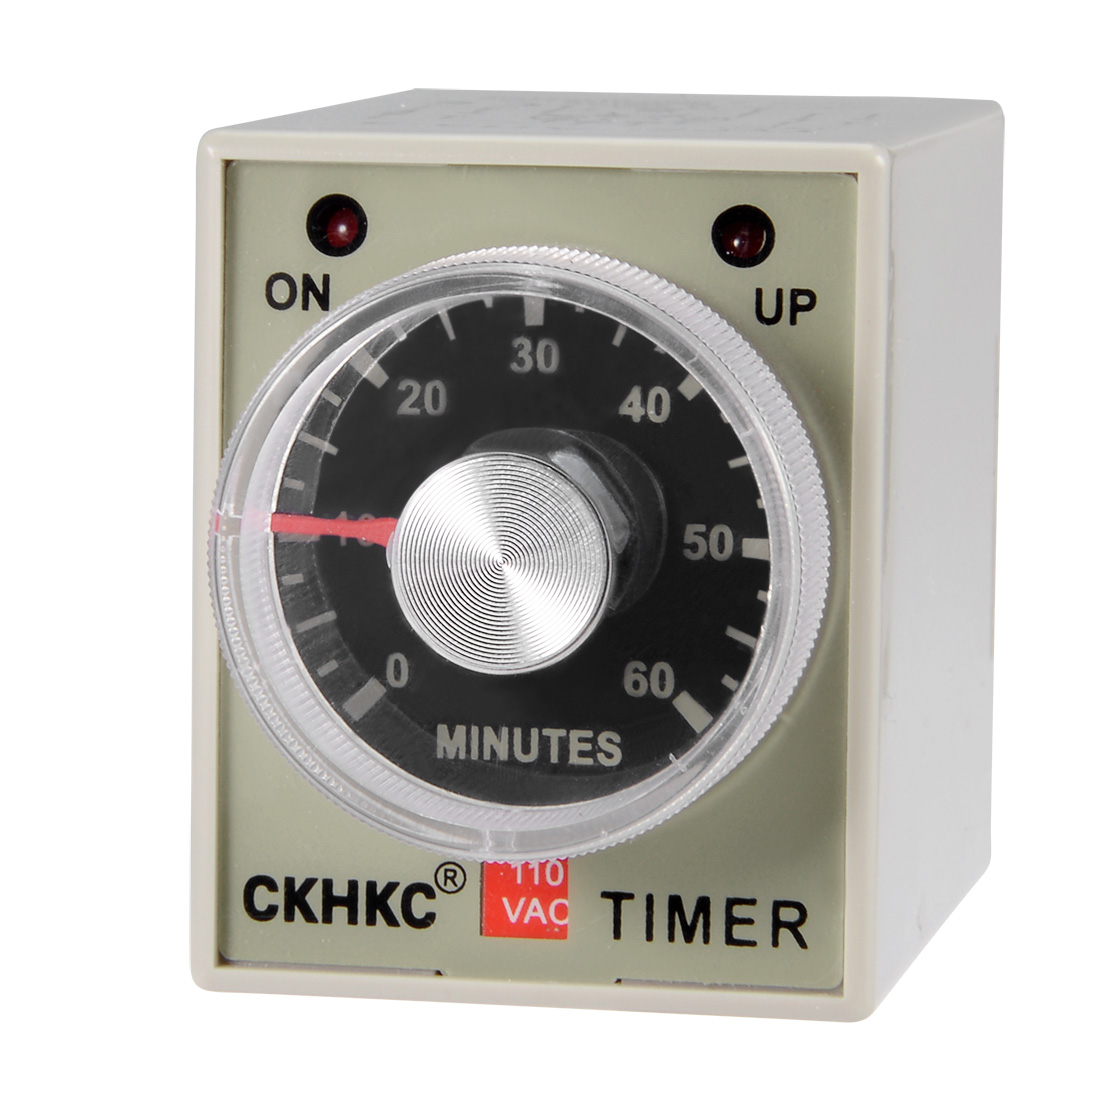 AC110V 60M Time Range 8 Terminals Adjustable Delay Timer Time Relay AH3-3